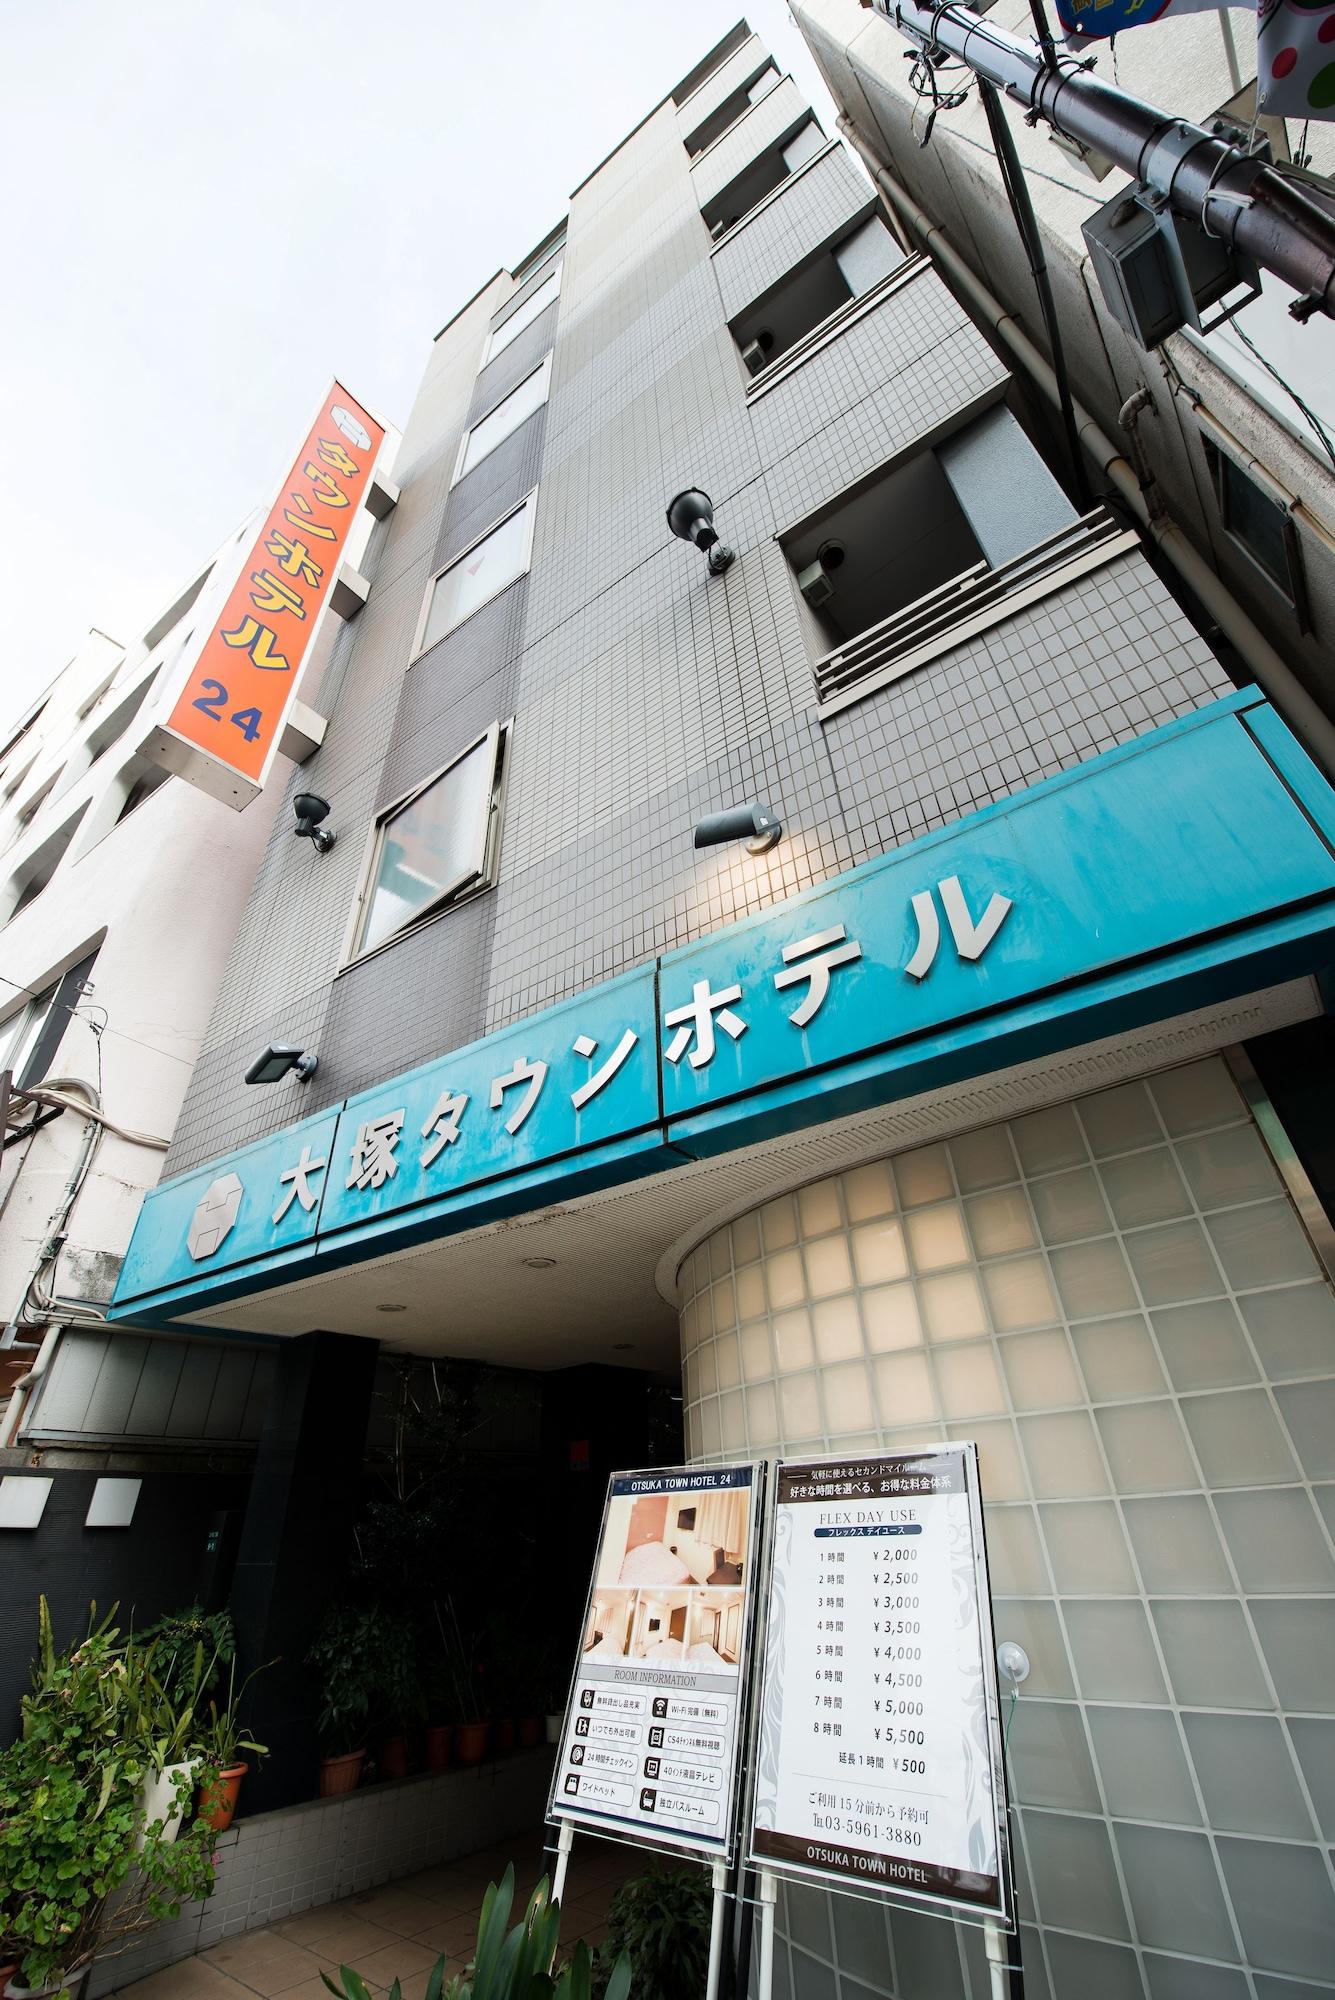 Otsuka Town Hotel 24, Toshima